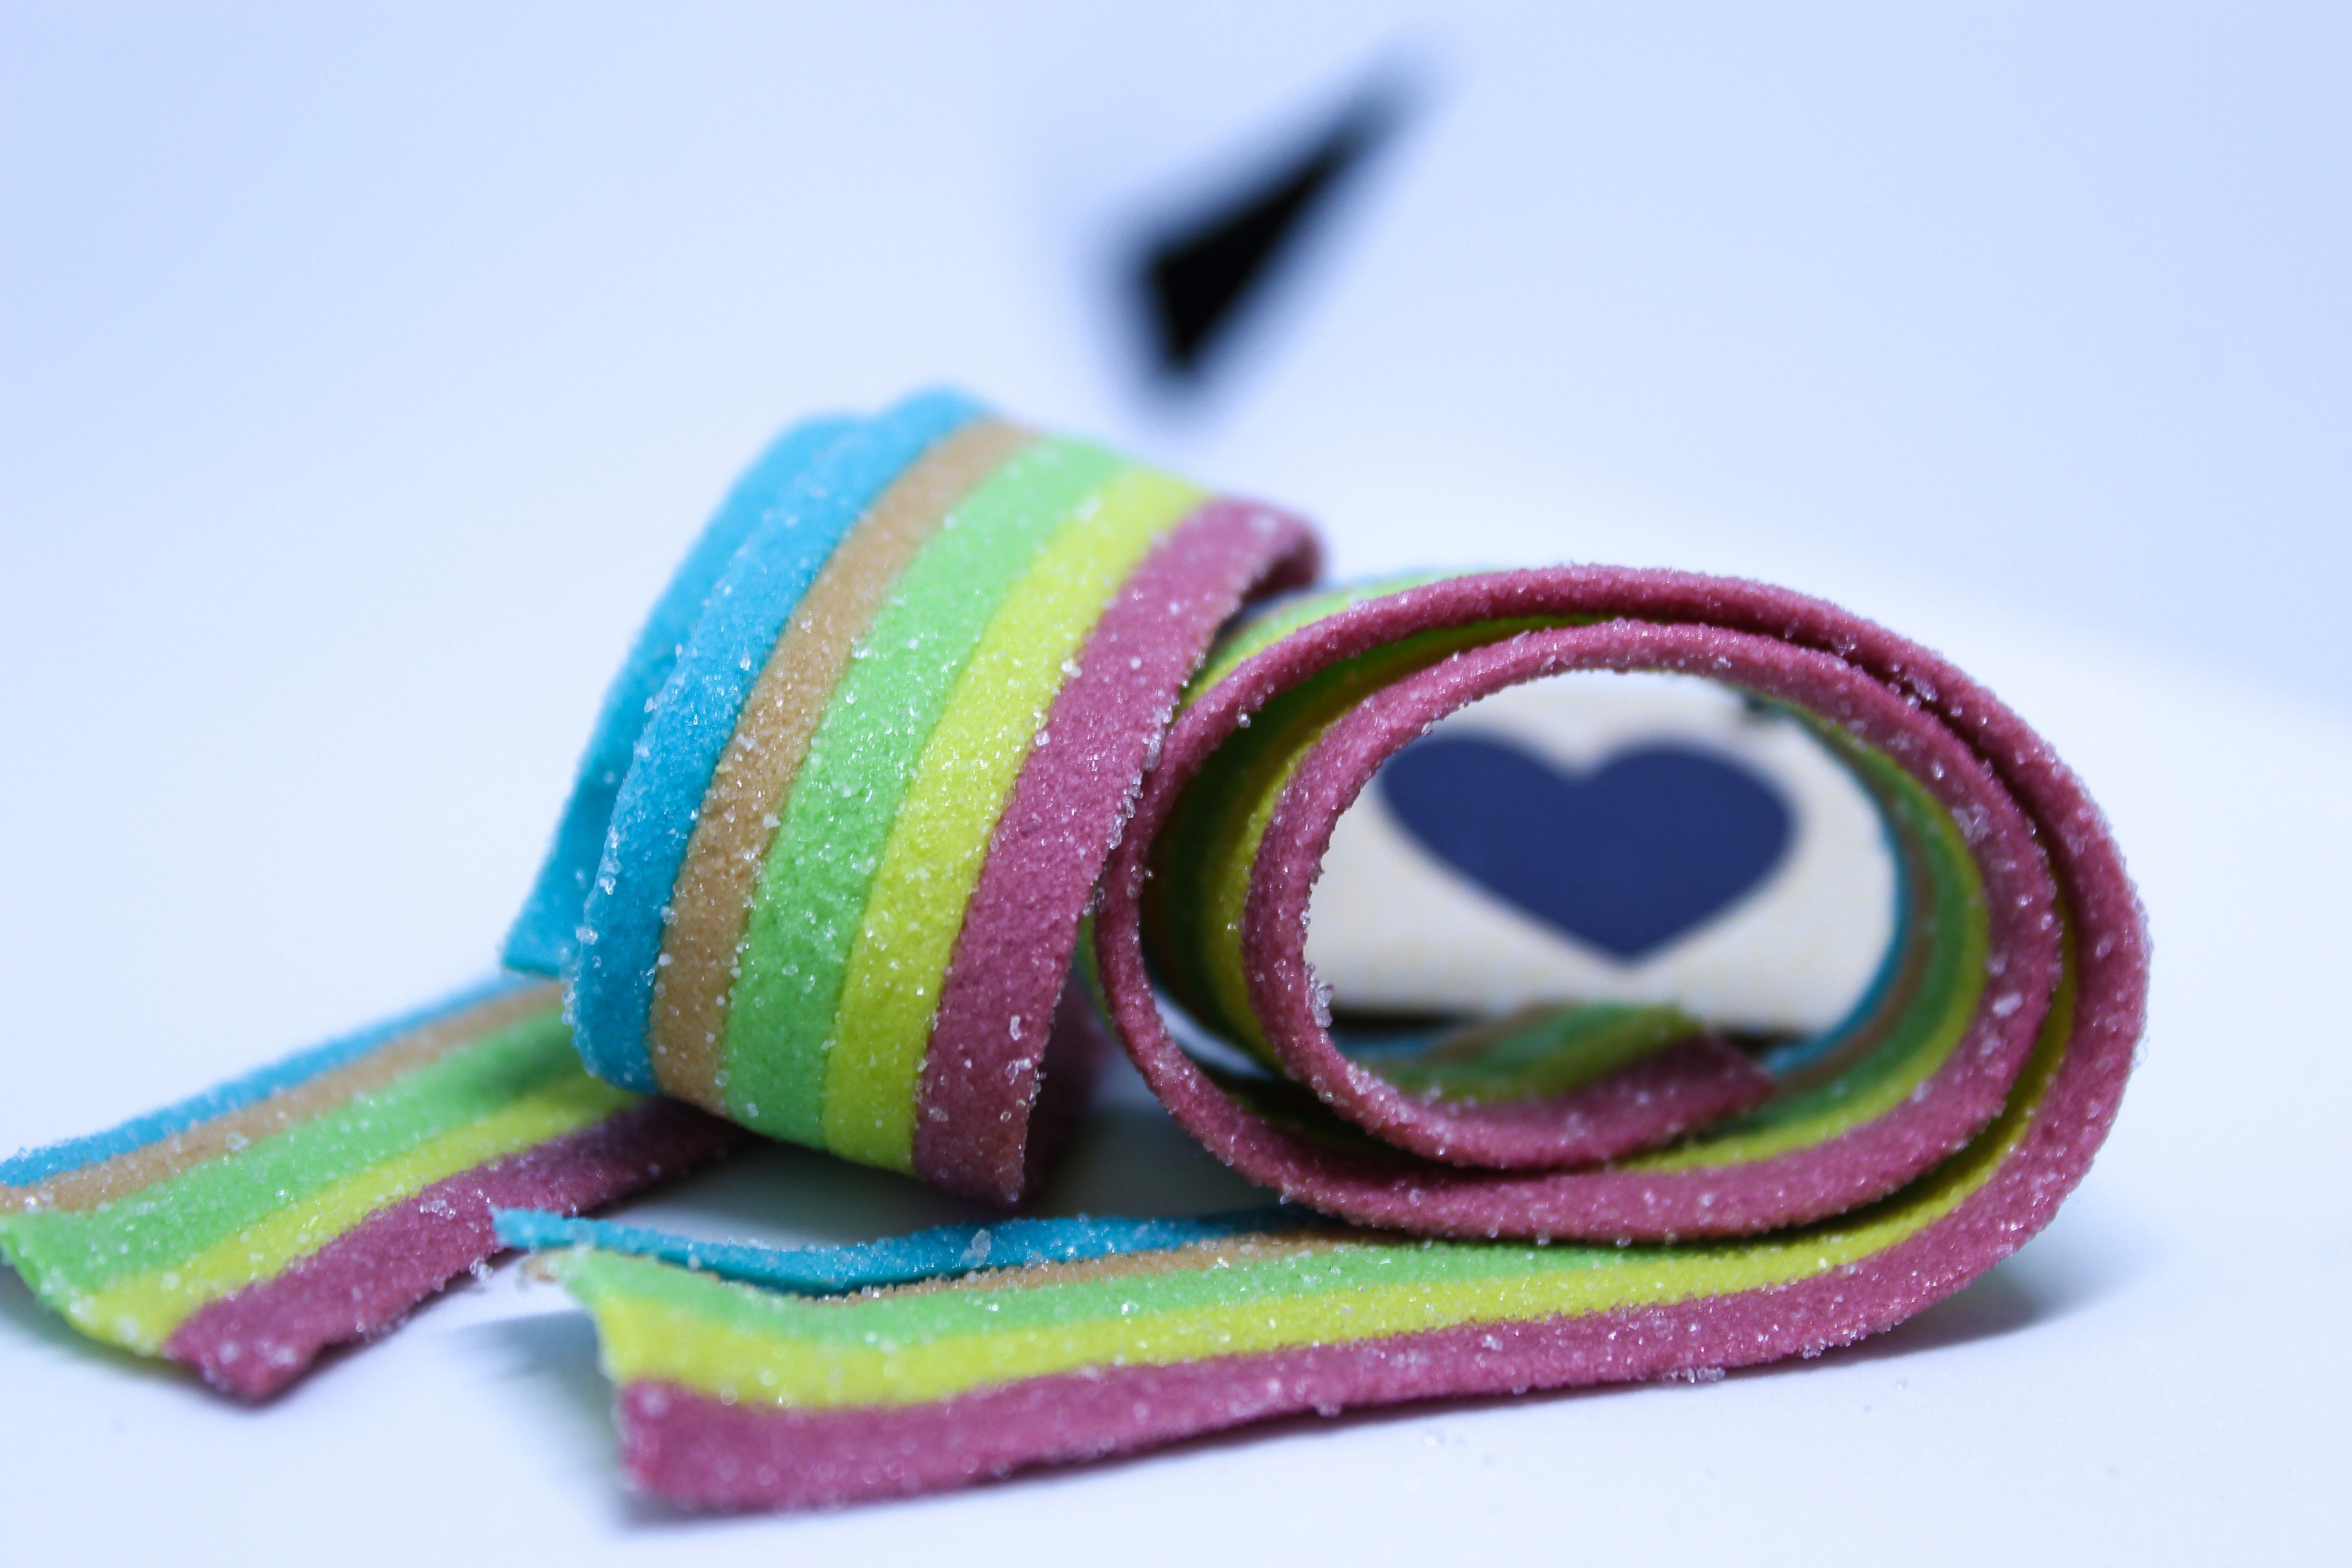 Free stock photo of #LGBTQIA#heart#lollies